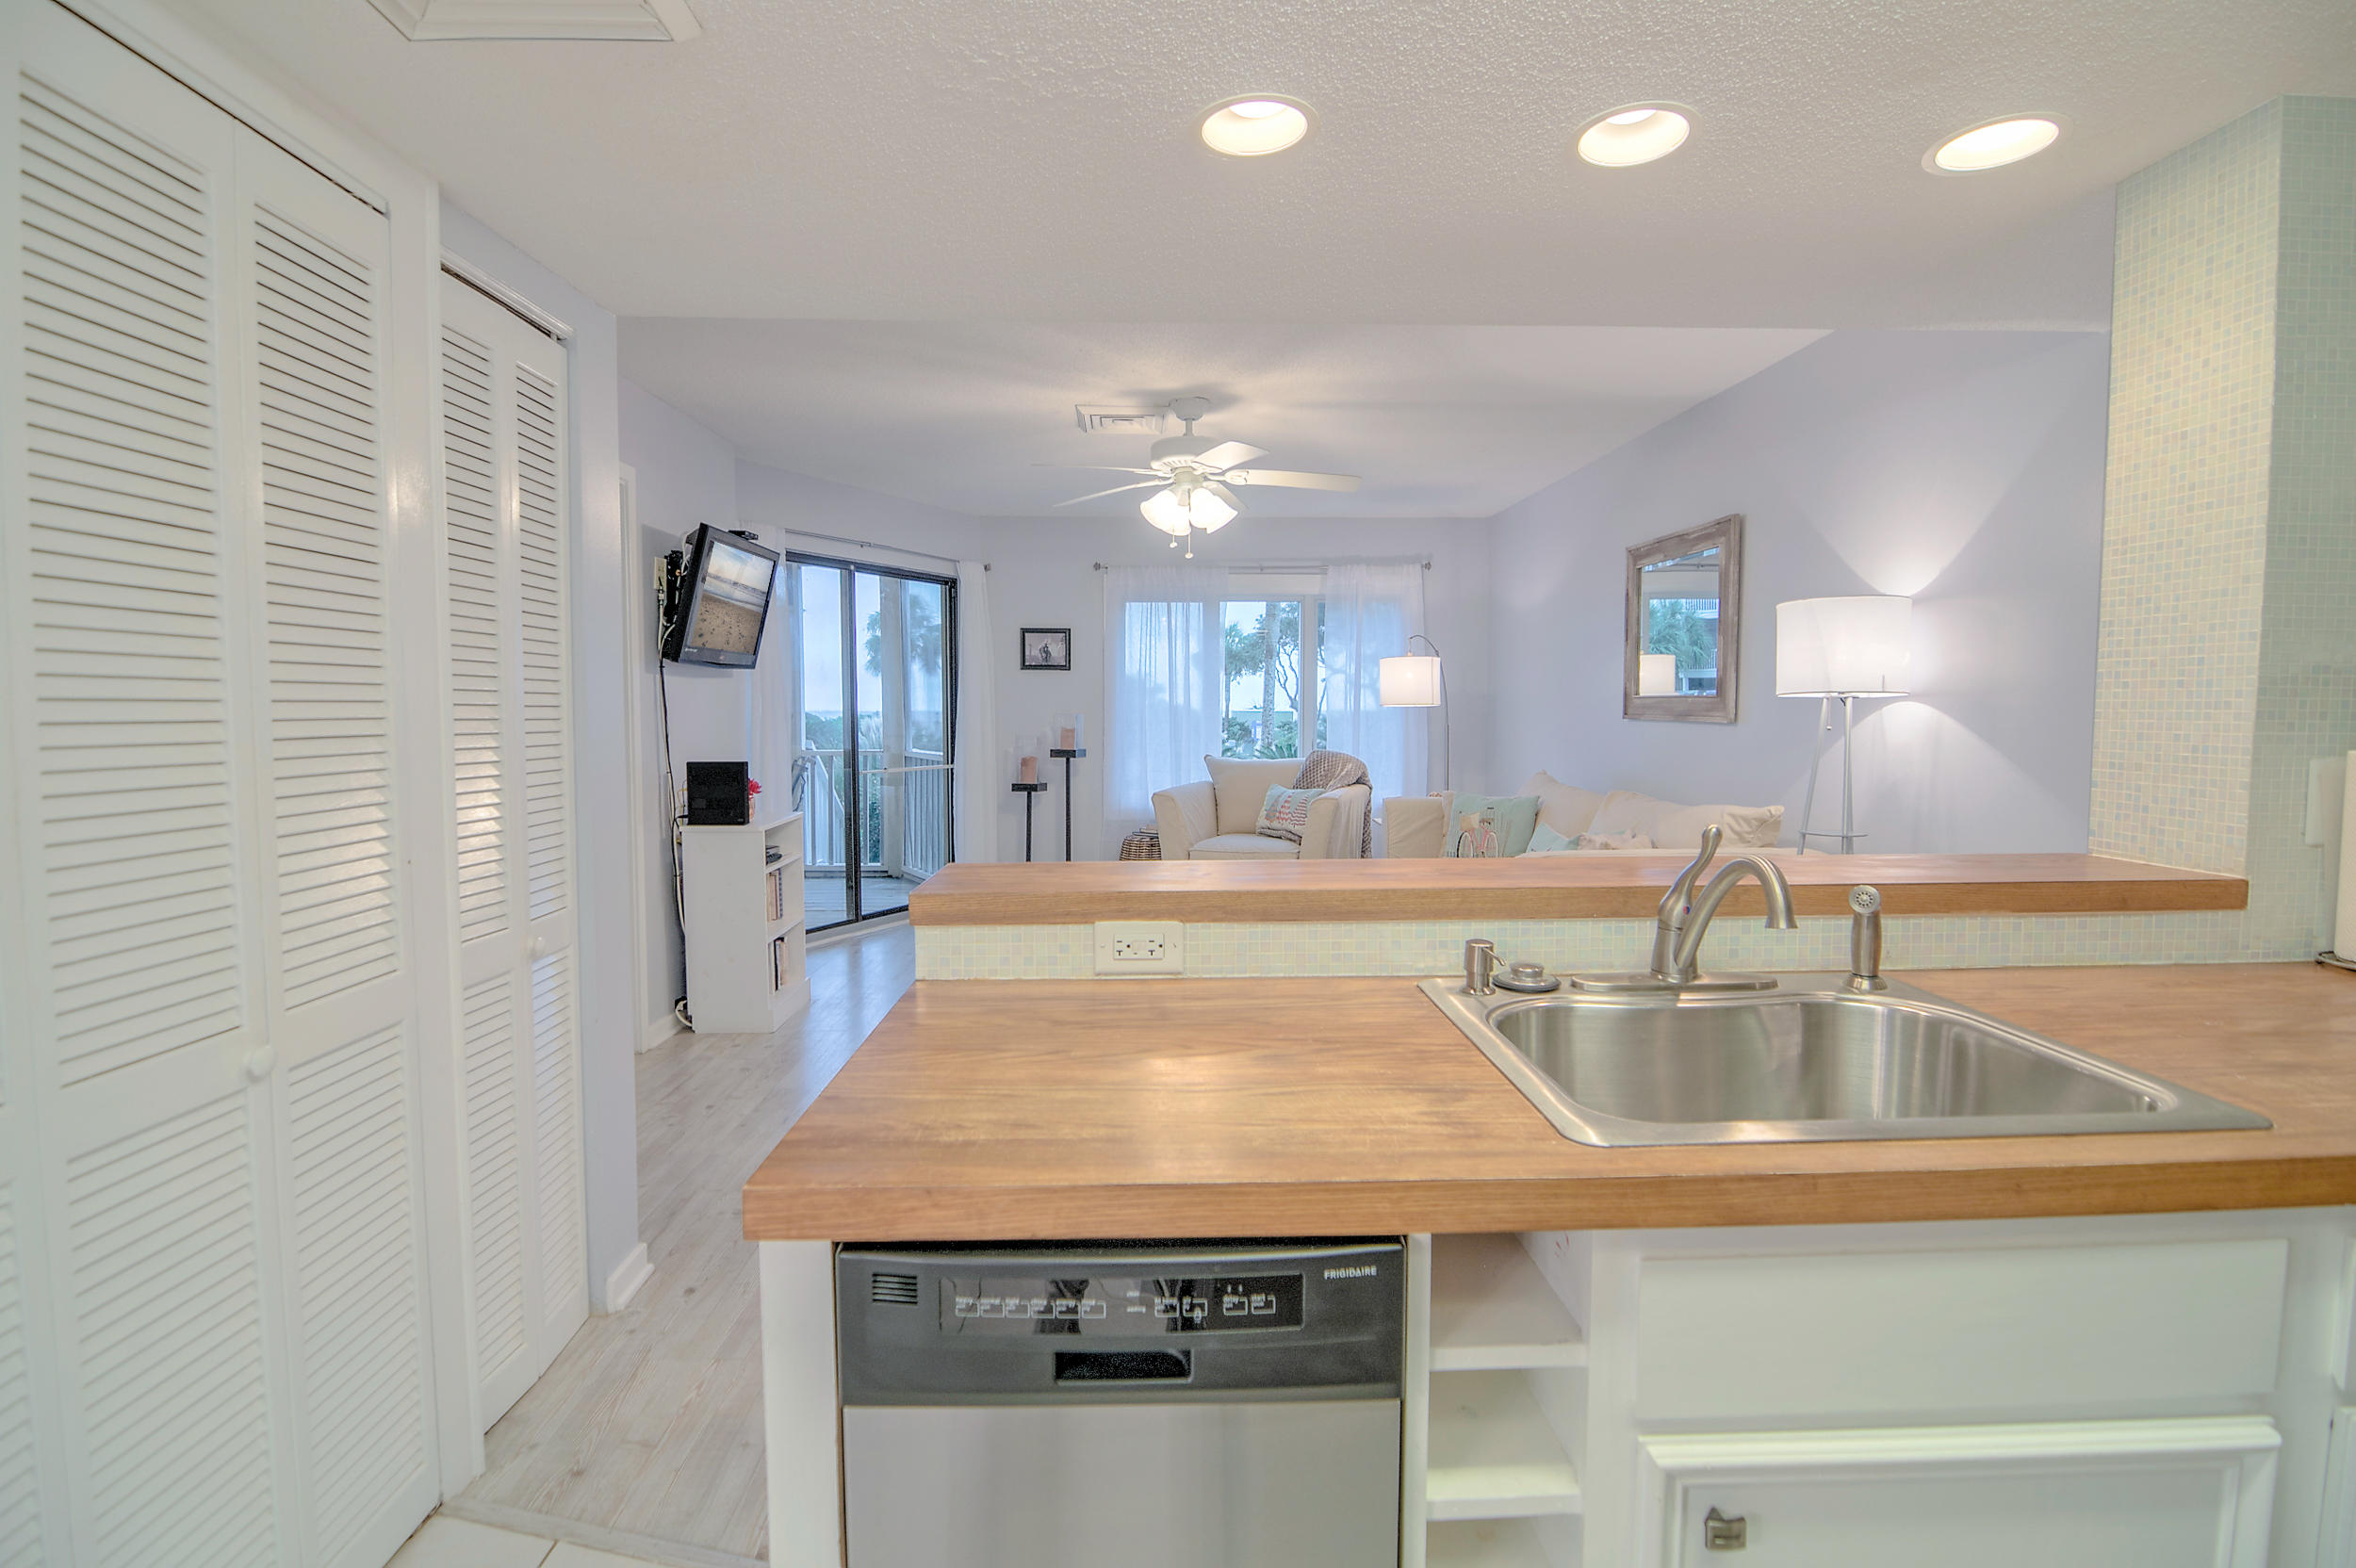 Port Ocall Homes For Sale - 103 Port O Call, Isle of Palms, SC - 5